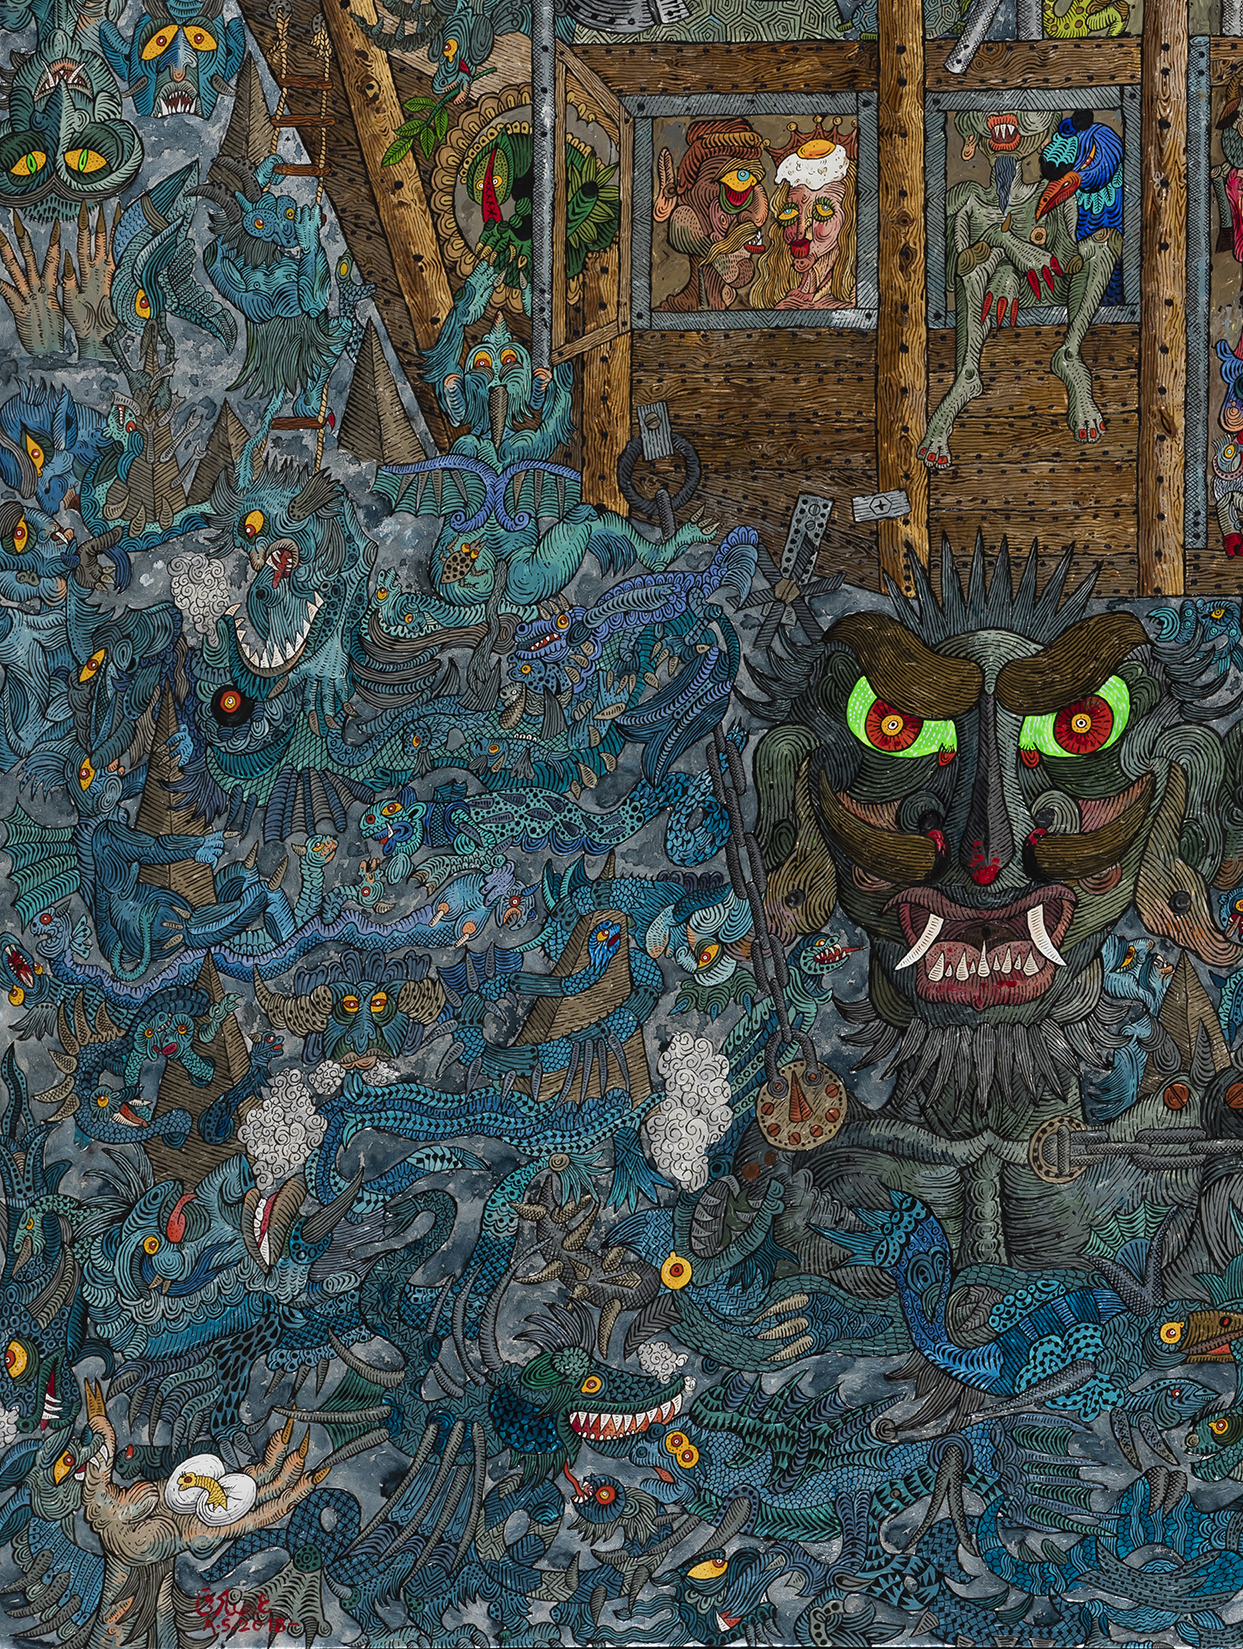 Ali Akbar Sadeghi - As Demon Noah, detail 3